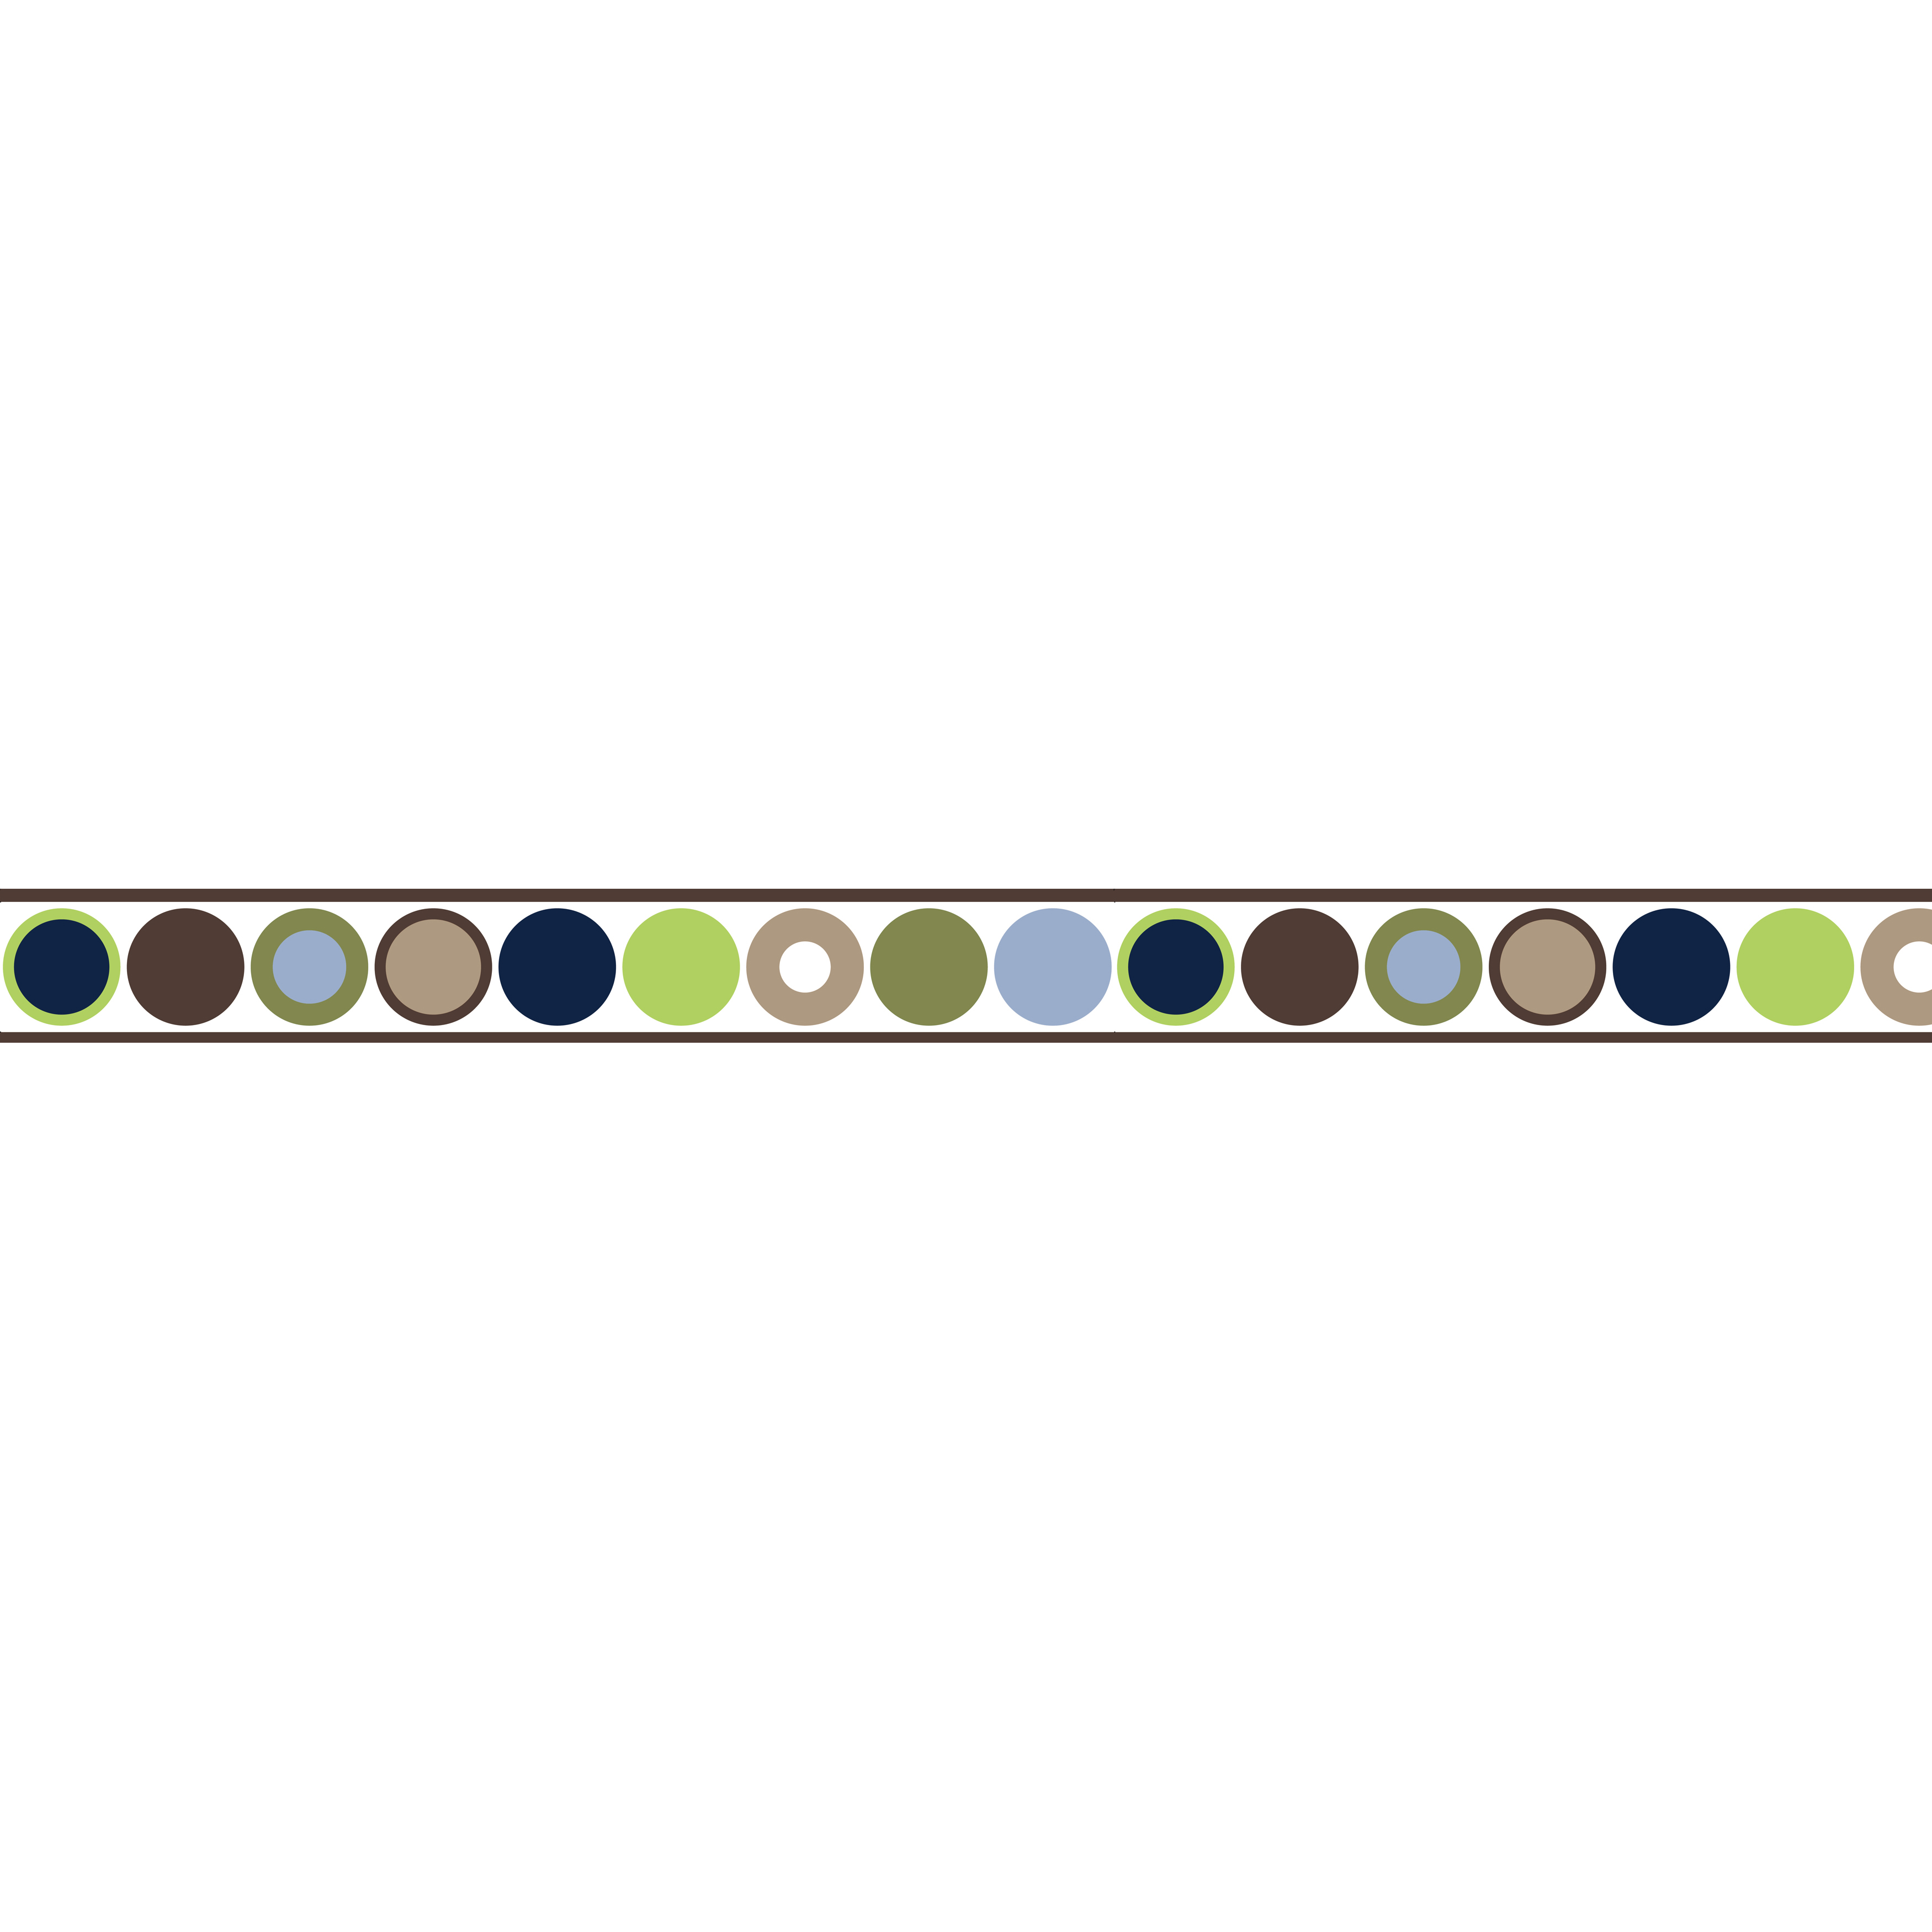 Jojo Designs Wallpaper Border Images TheCelebrityPix 3500x3500